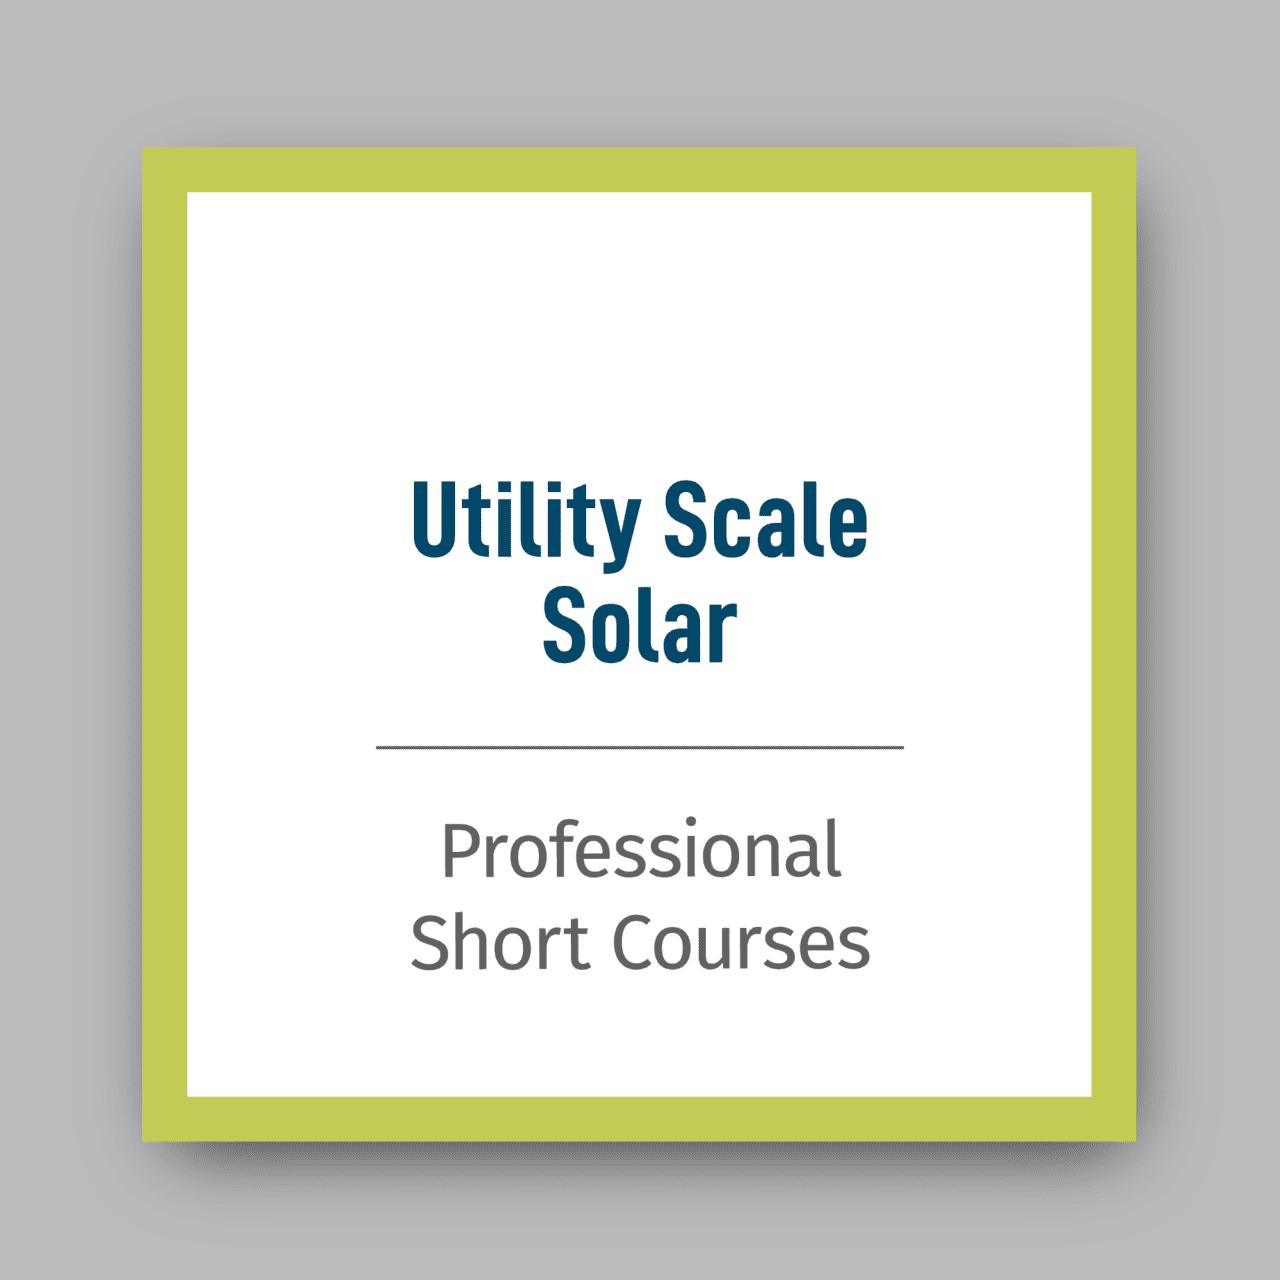 Utility-Scale-Solar